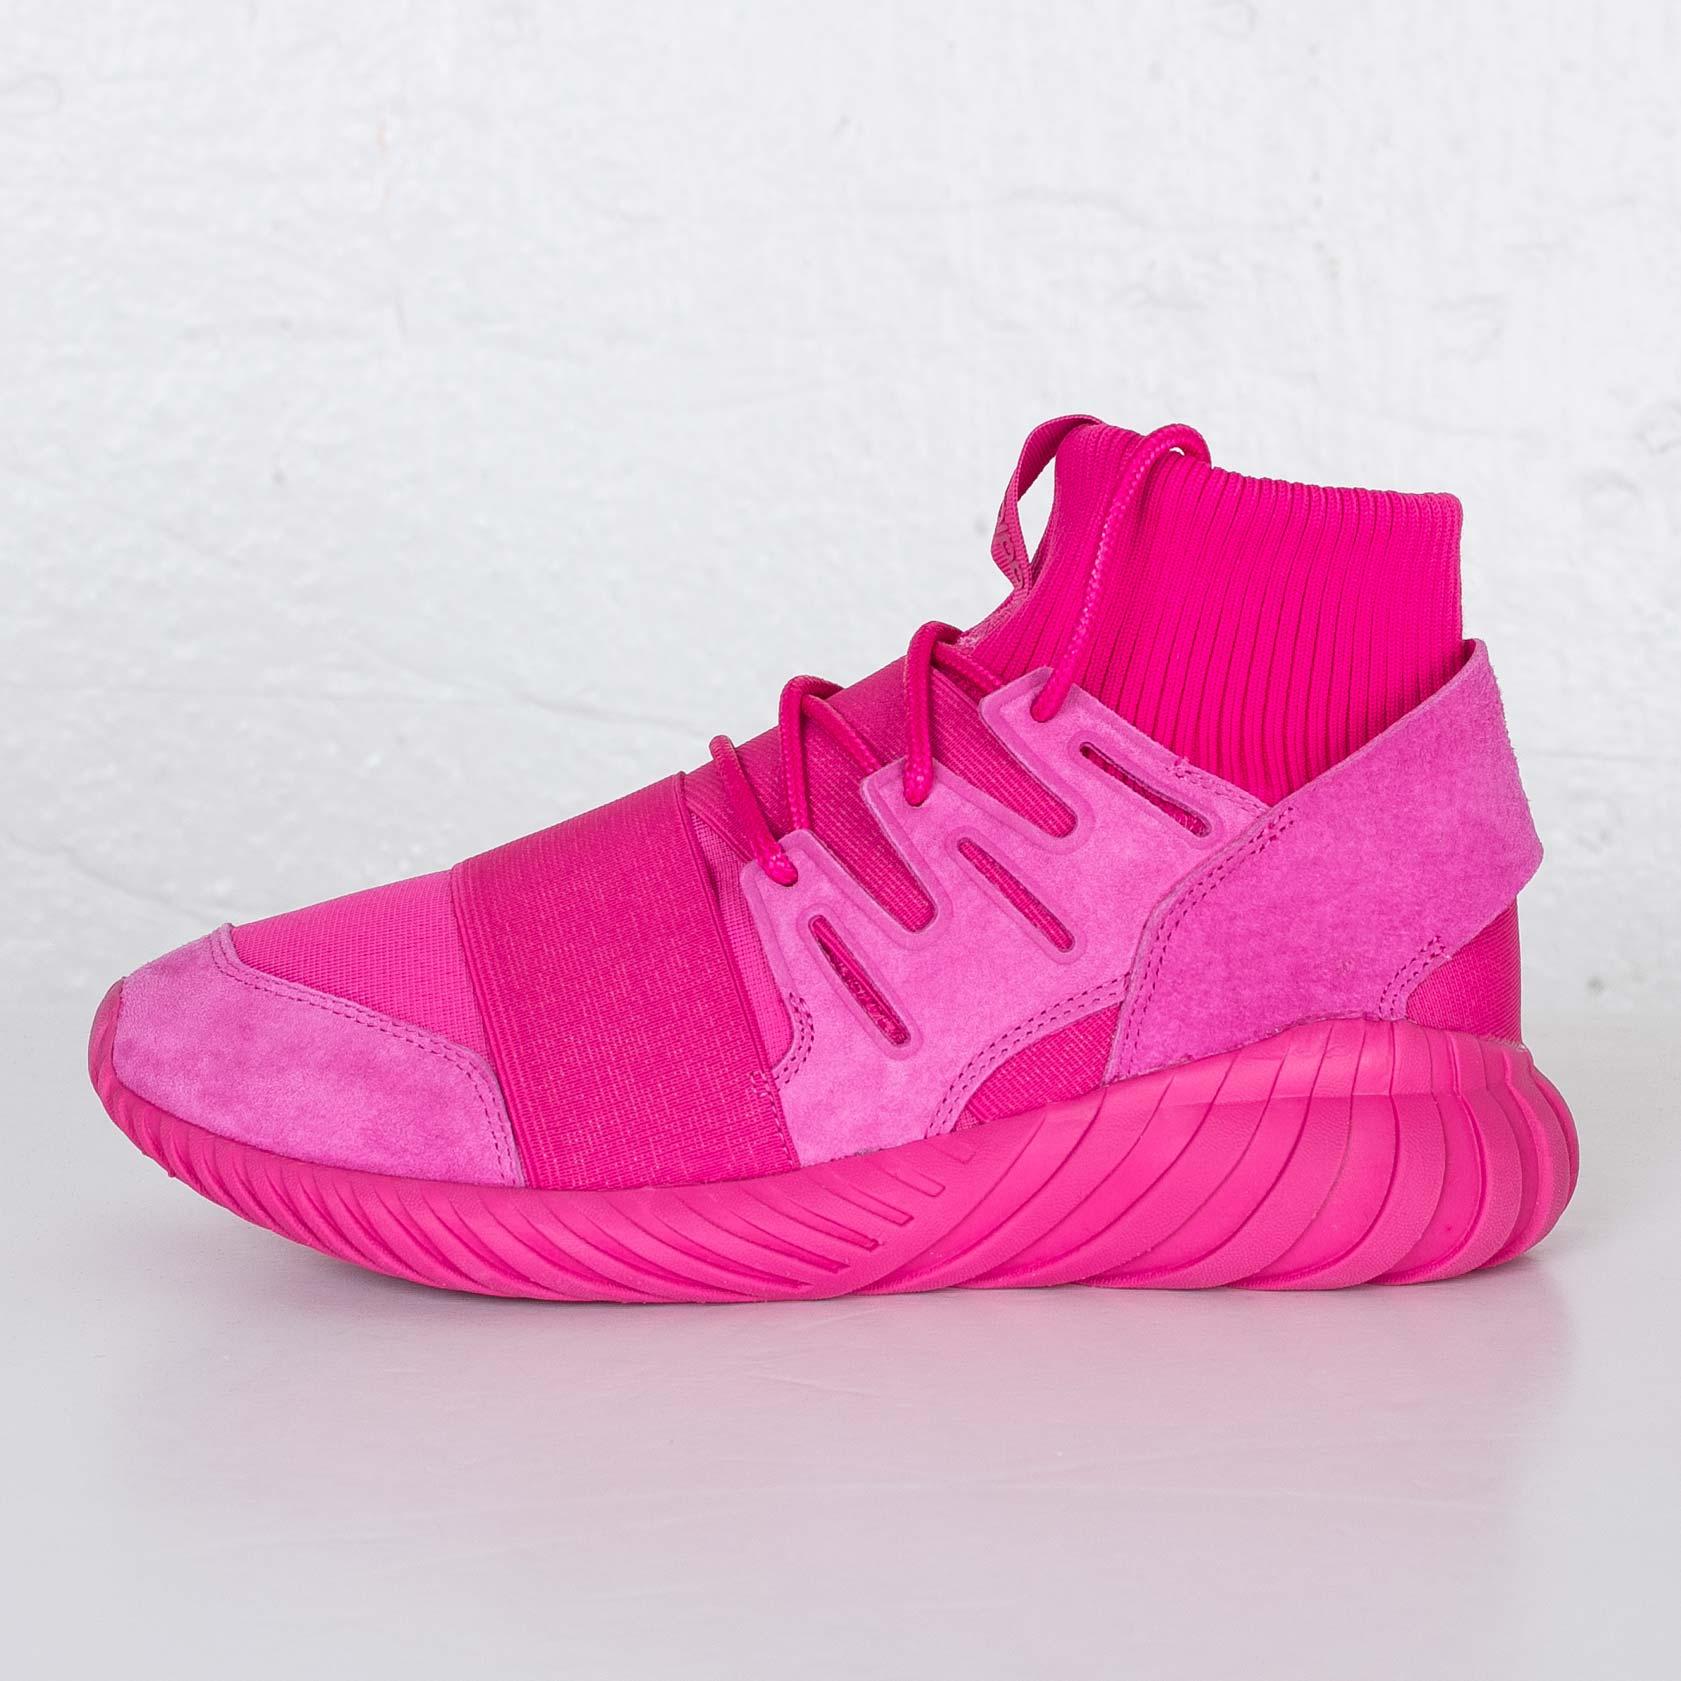 36752dac4829 adidas Tubular Doom - S74795 - Sneakersnstuff